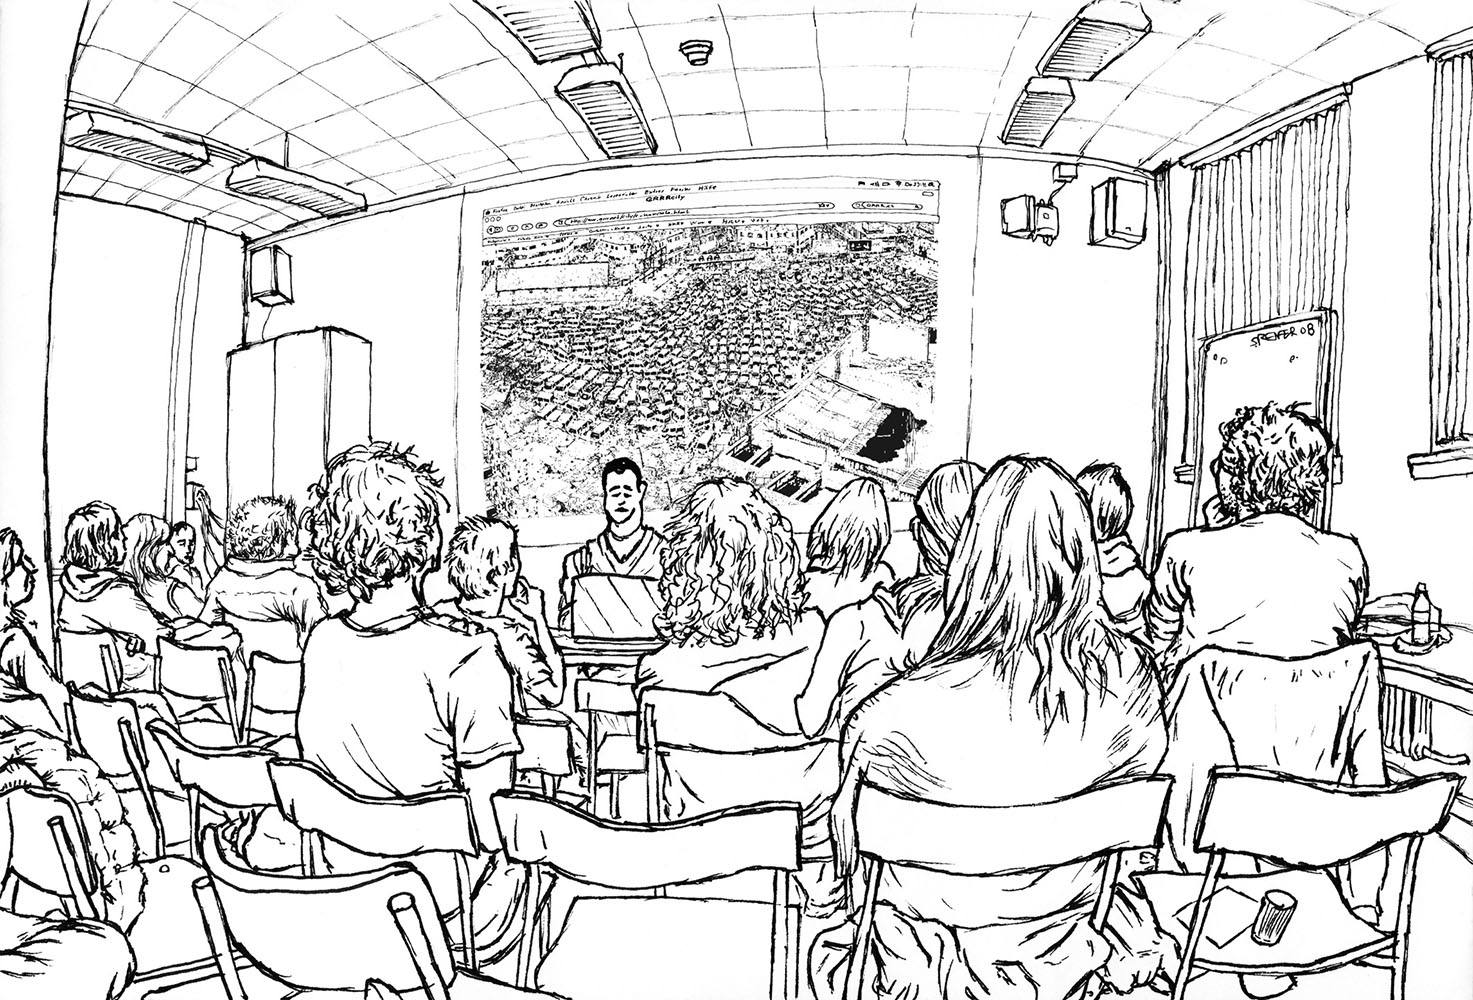 Symposium_klein.jpg